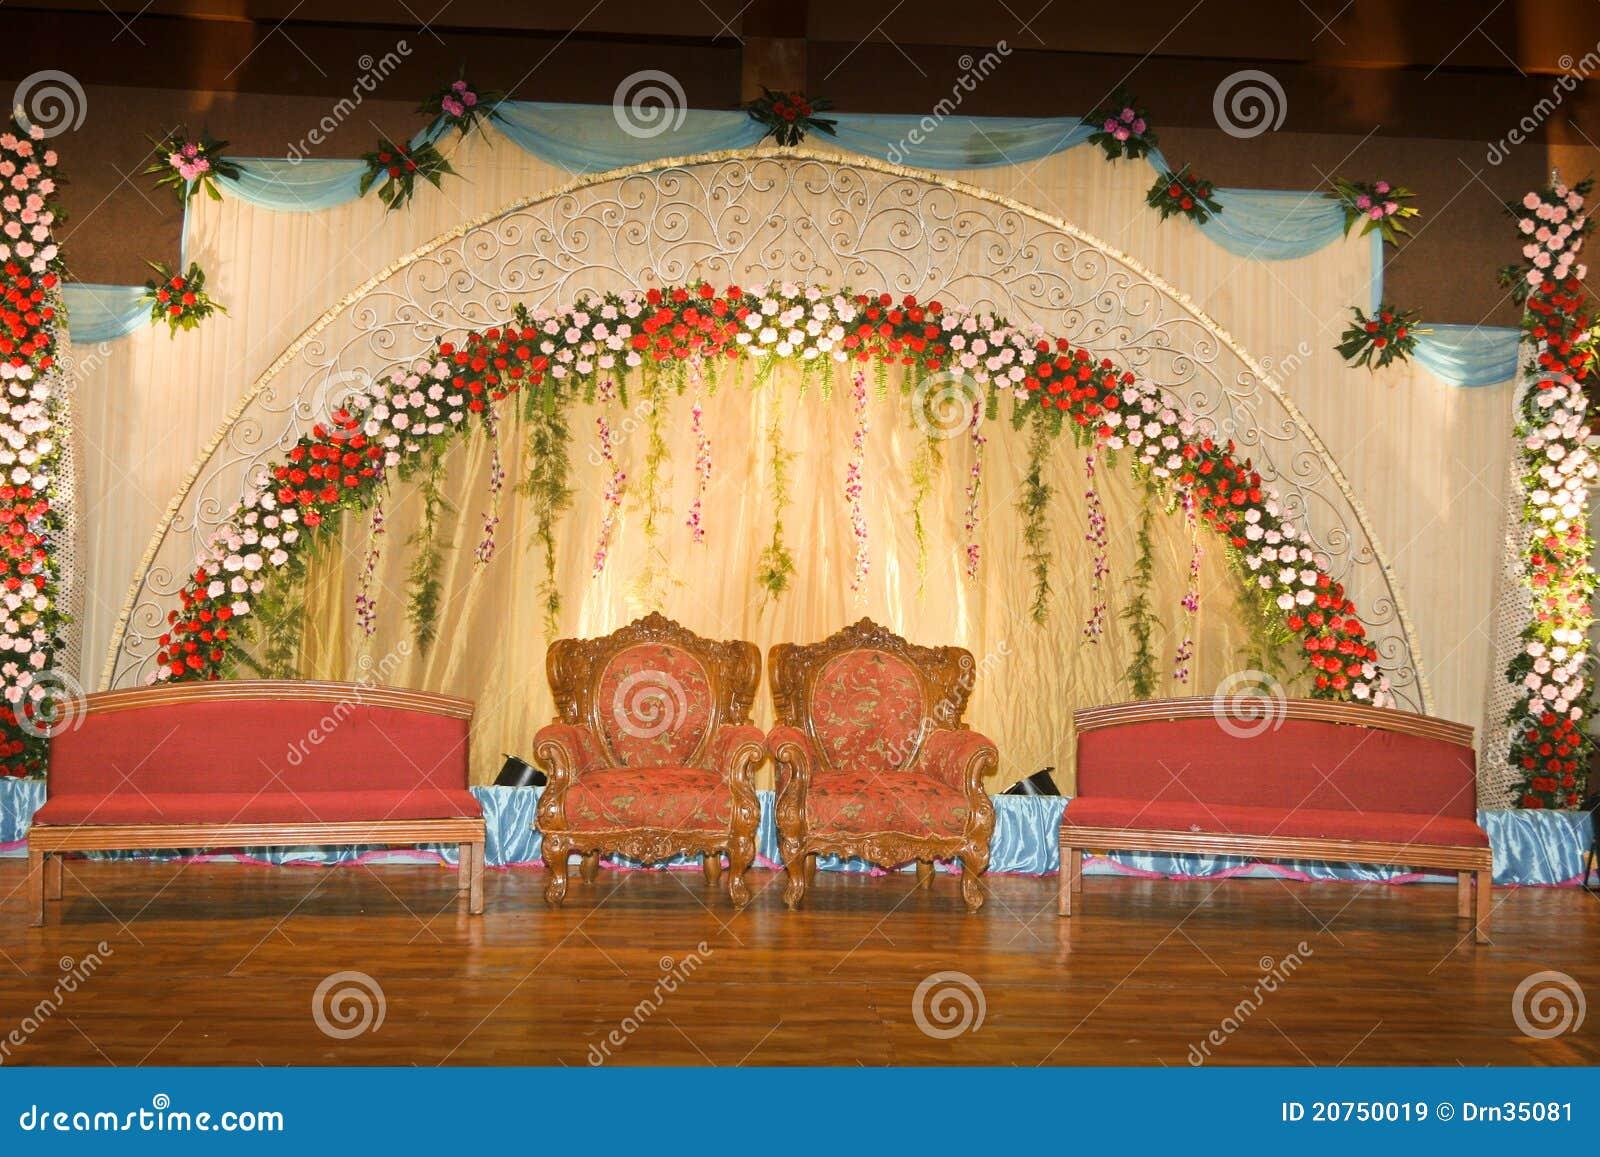 Wedding Decoration Hire Mornington Peninsula